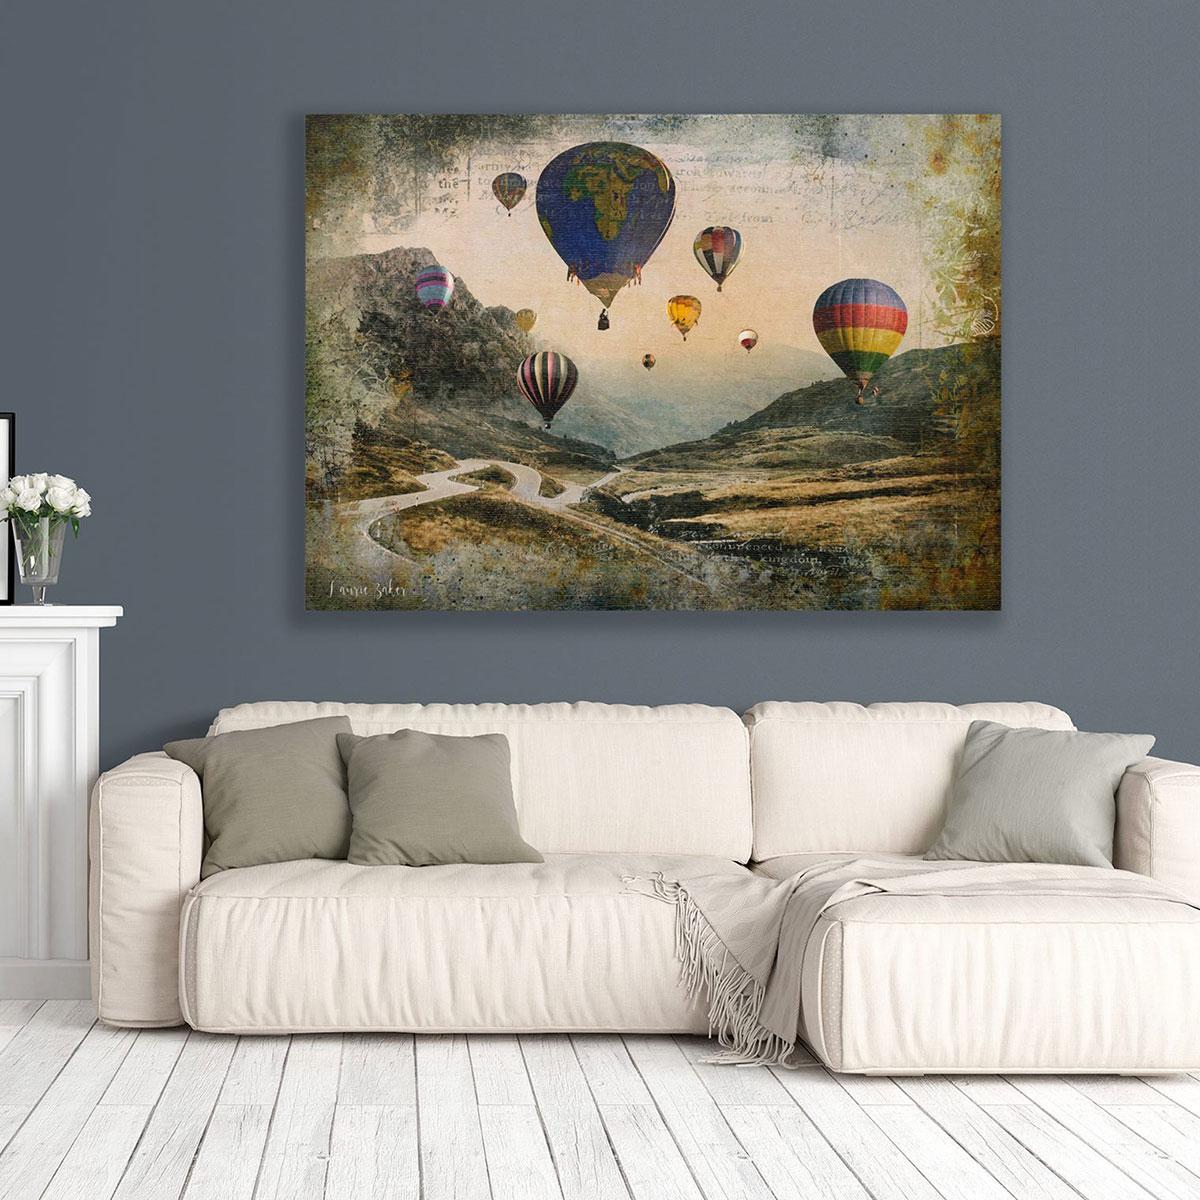 Art Boja Large Canvas Prints Wall Art Featuring Air Balloons